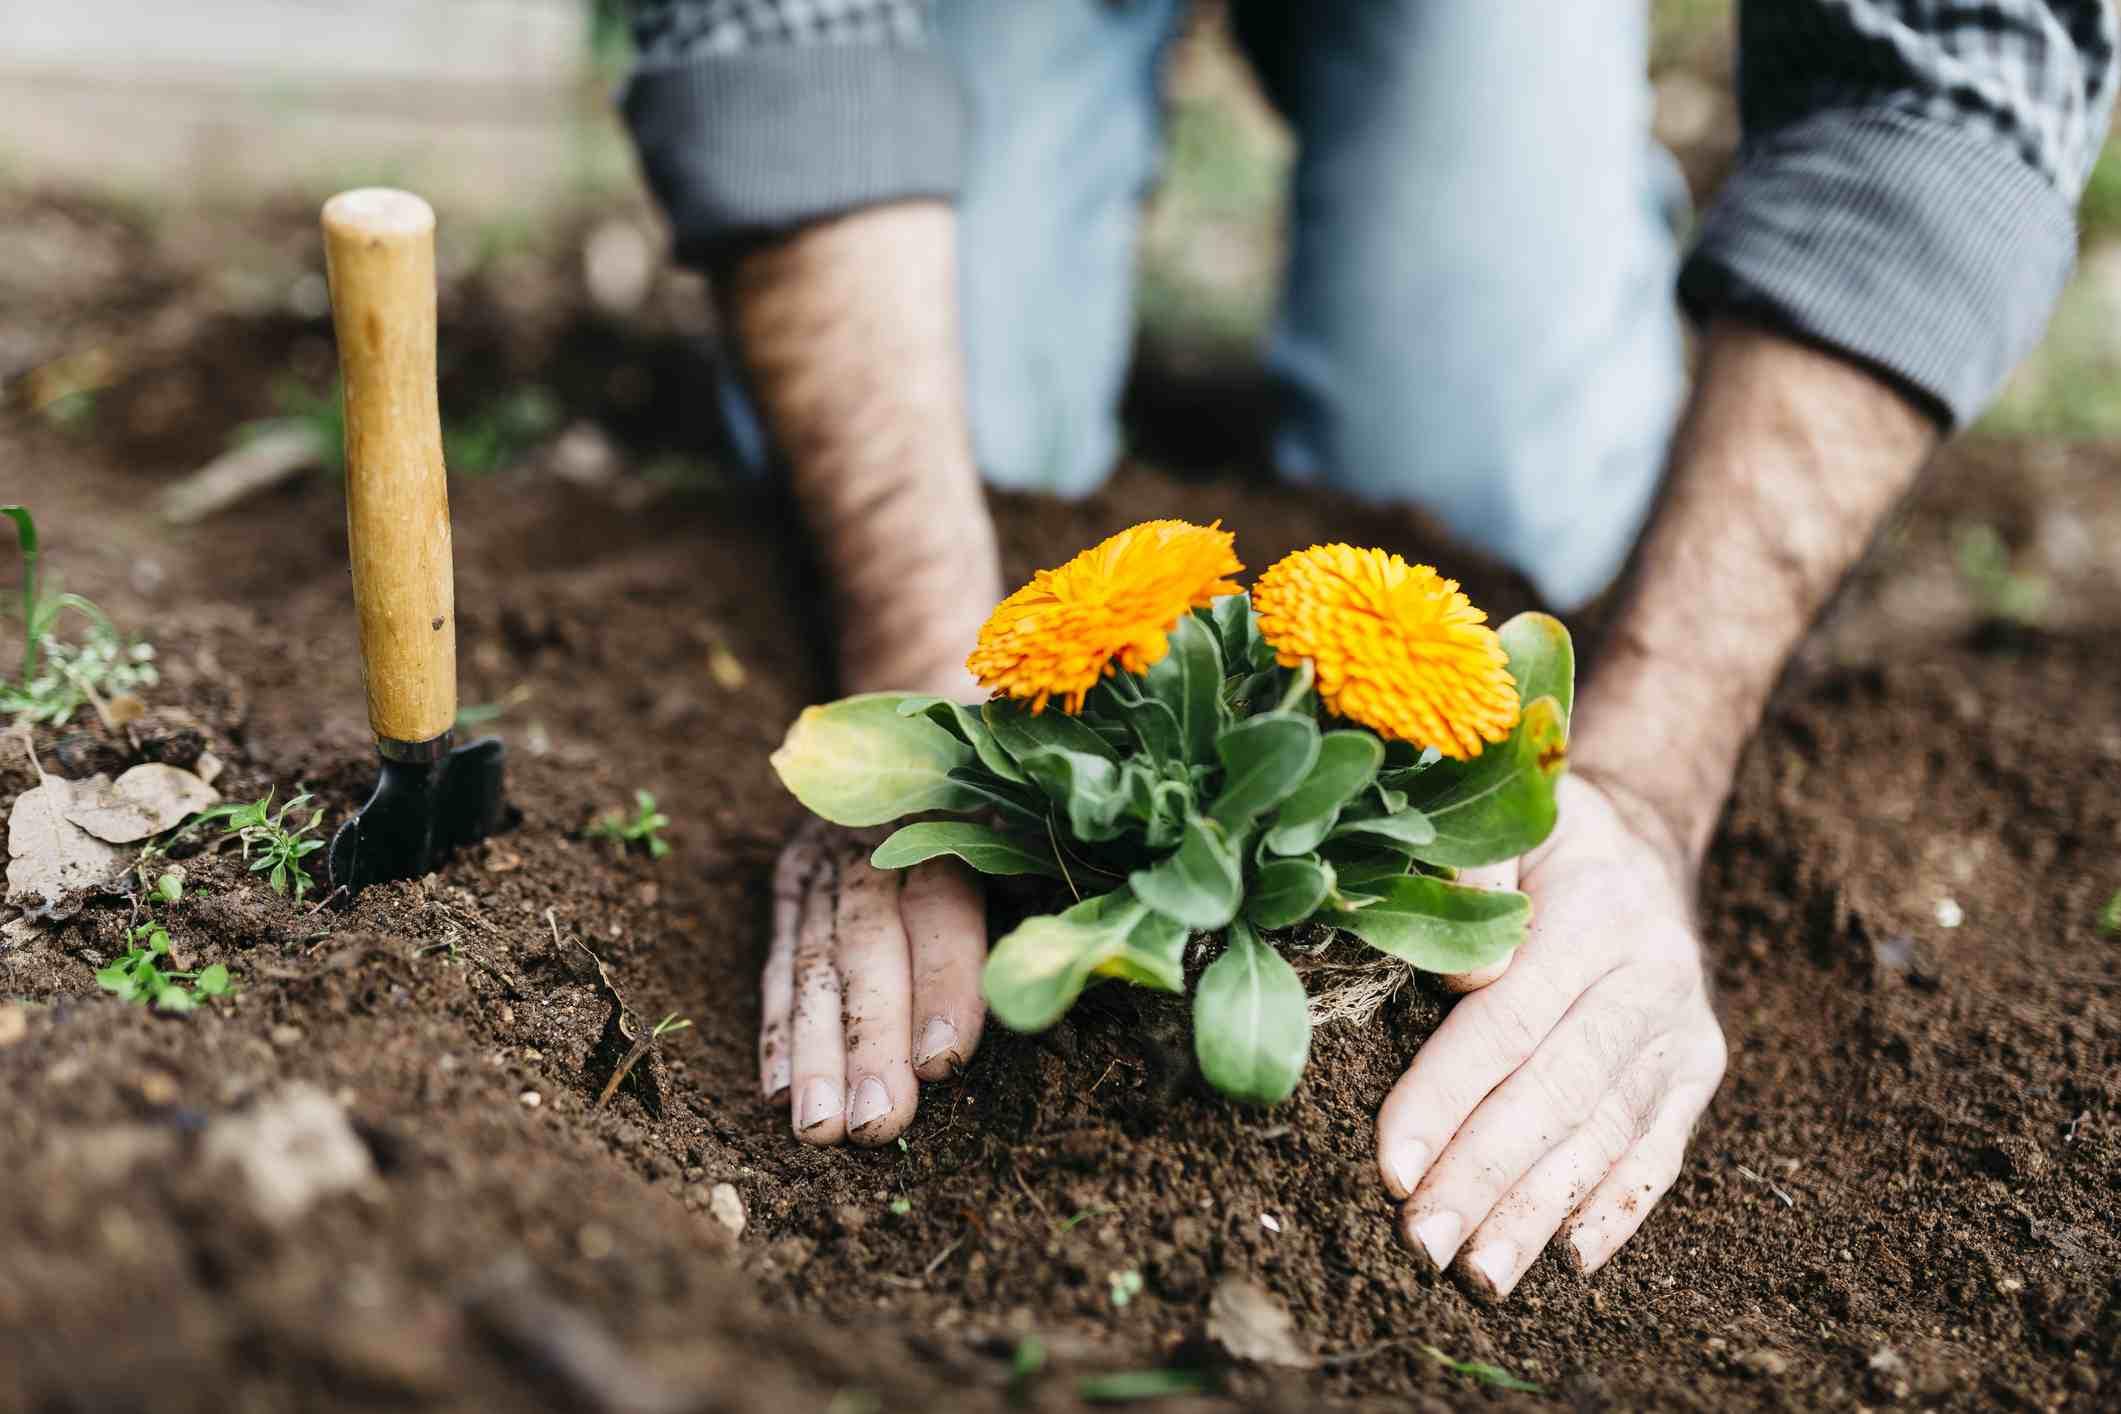 Gardener planting marigold flowers